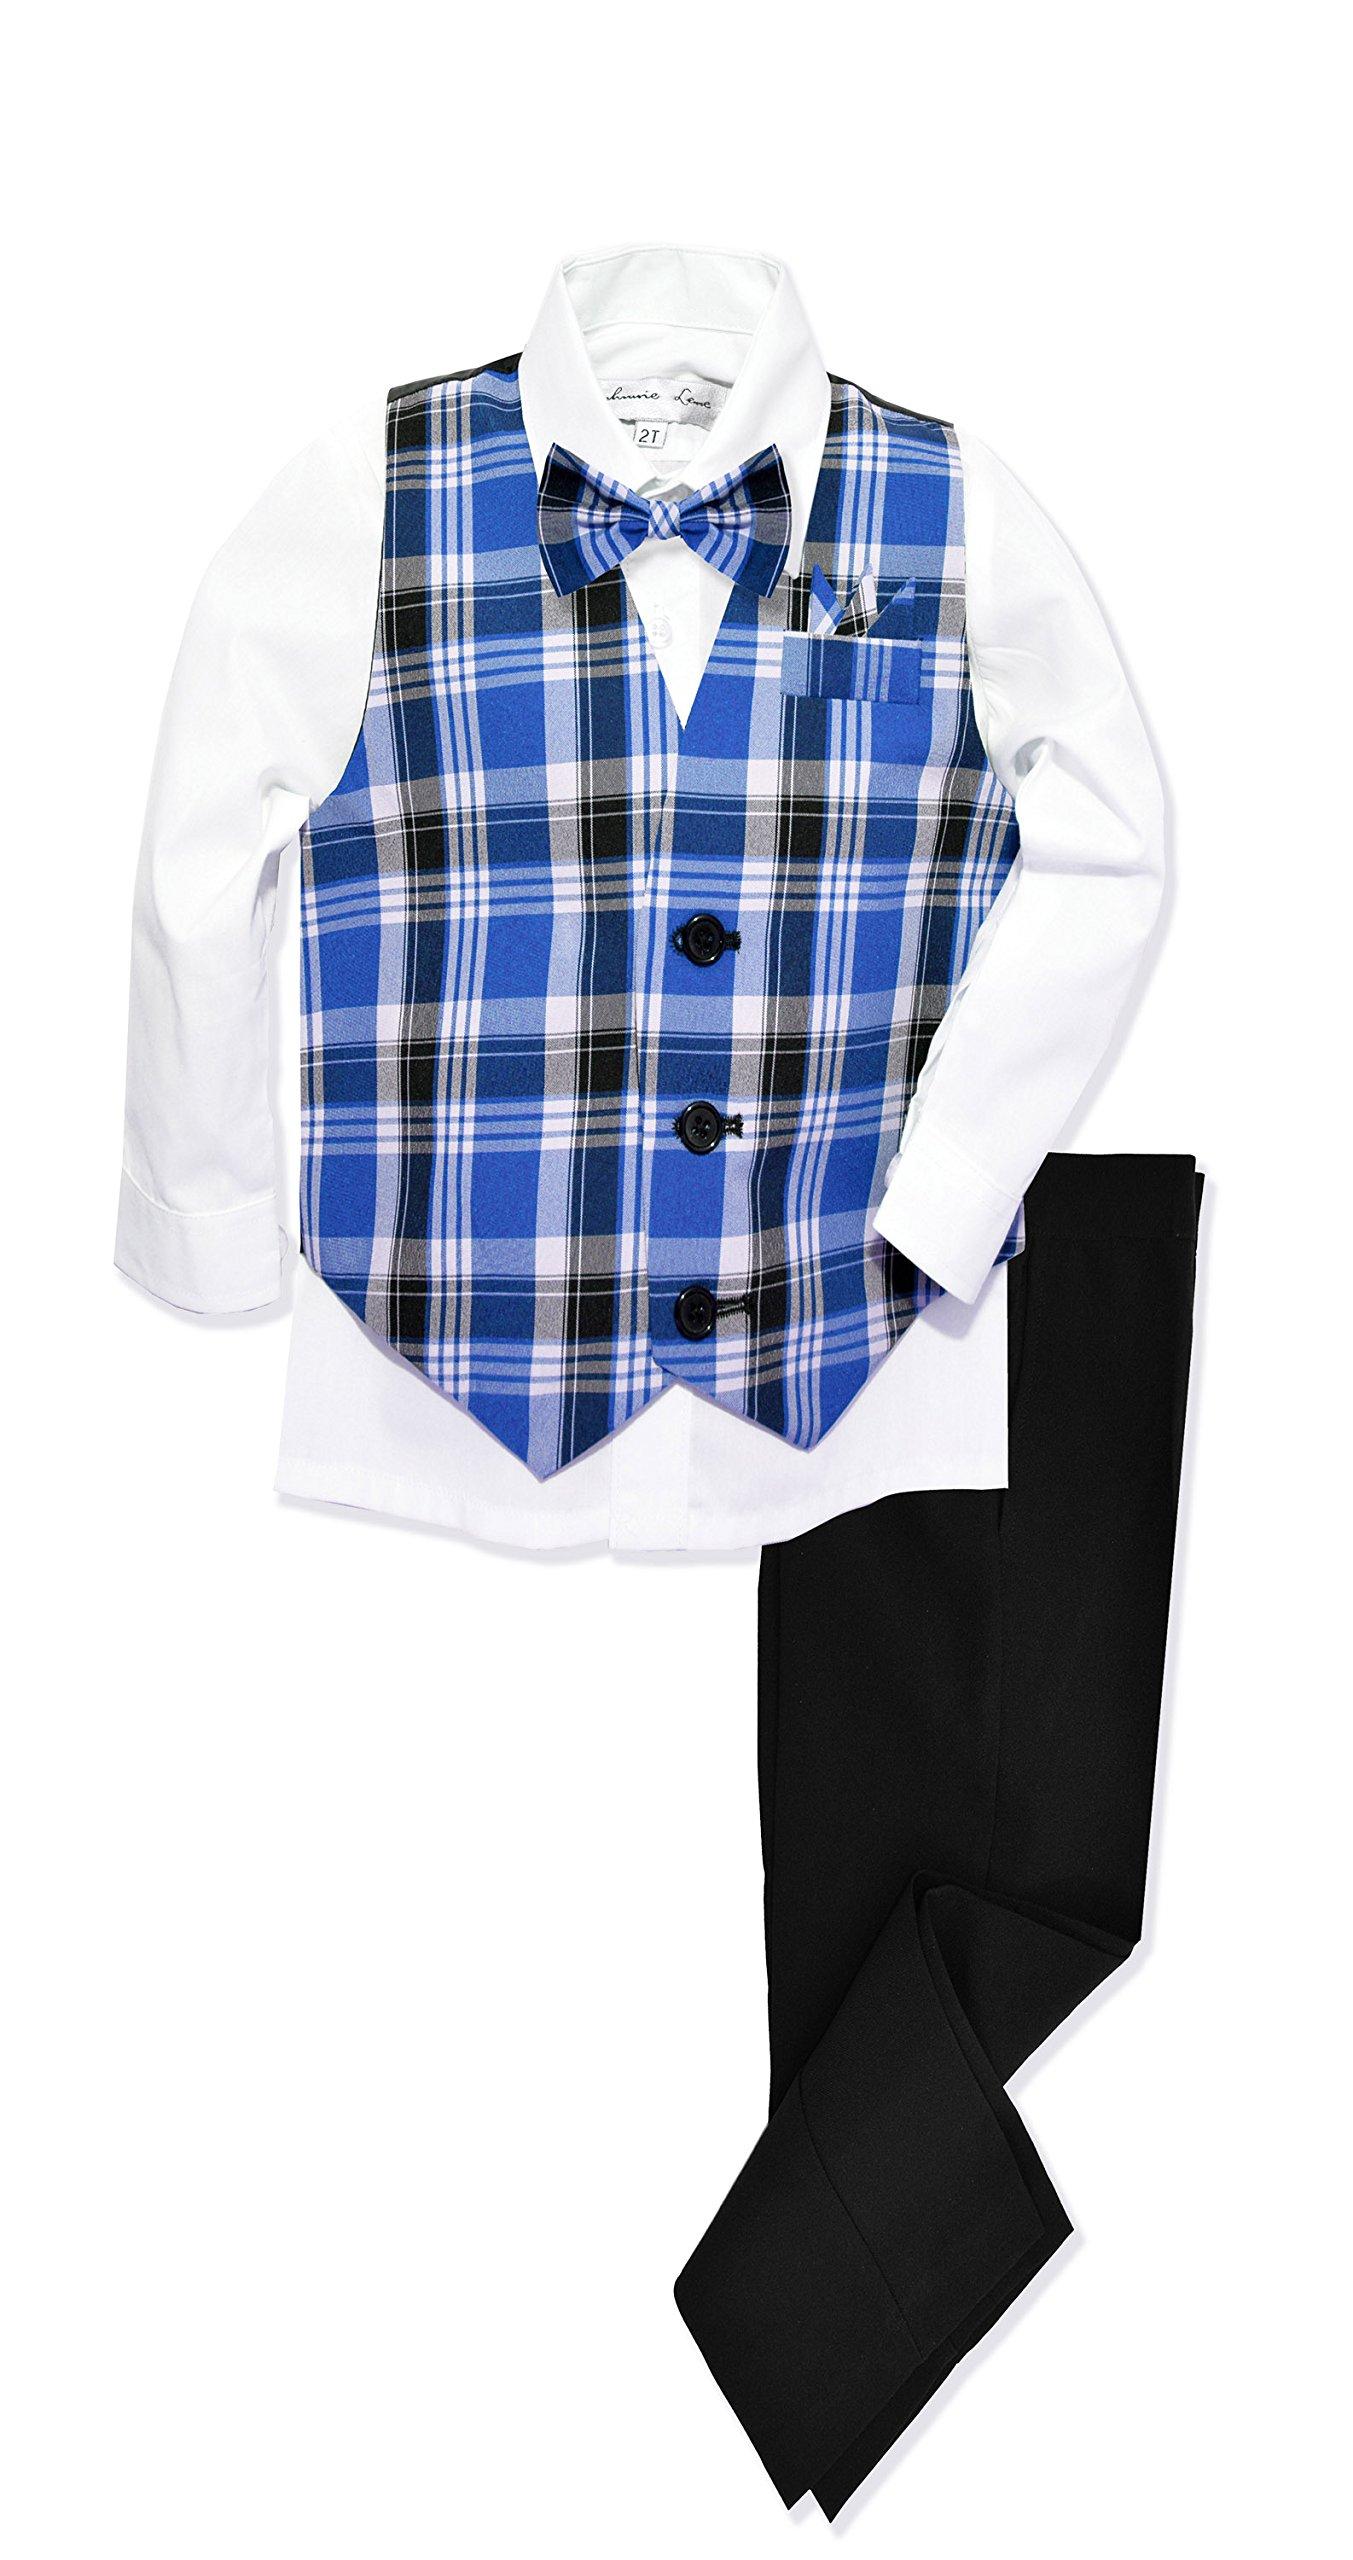 JL46 Boys Formal Plaid Dress Wear Vest Set (4T, Royal) by Johnnie Lene (Image #2)